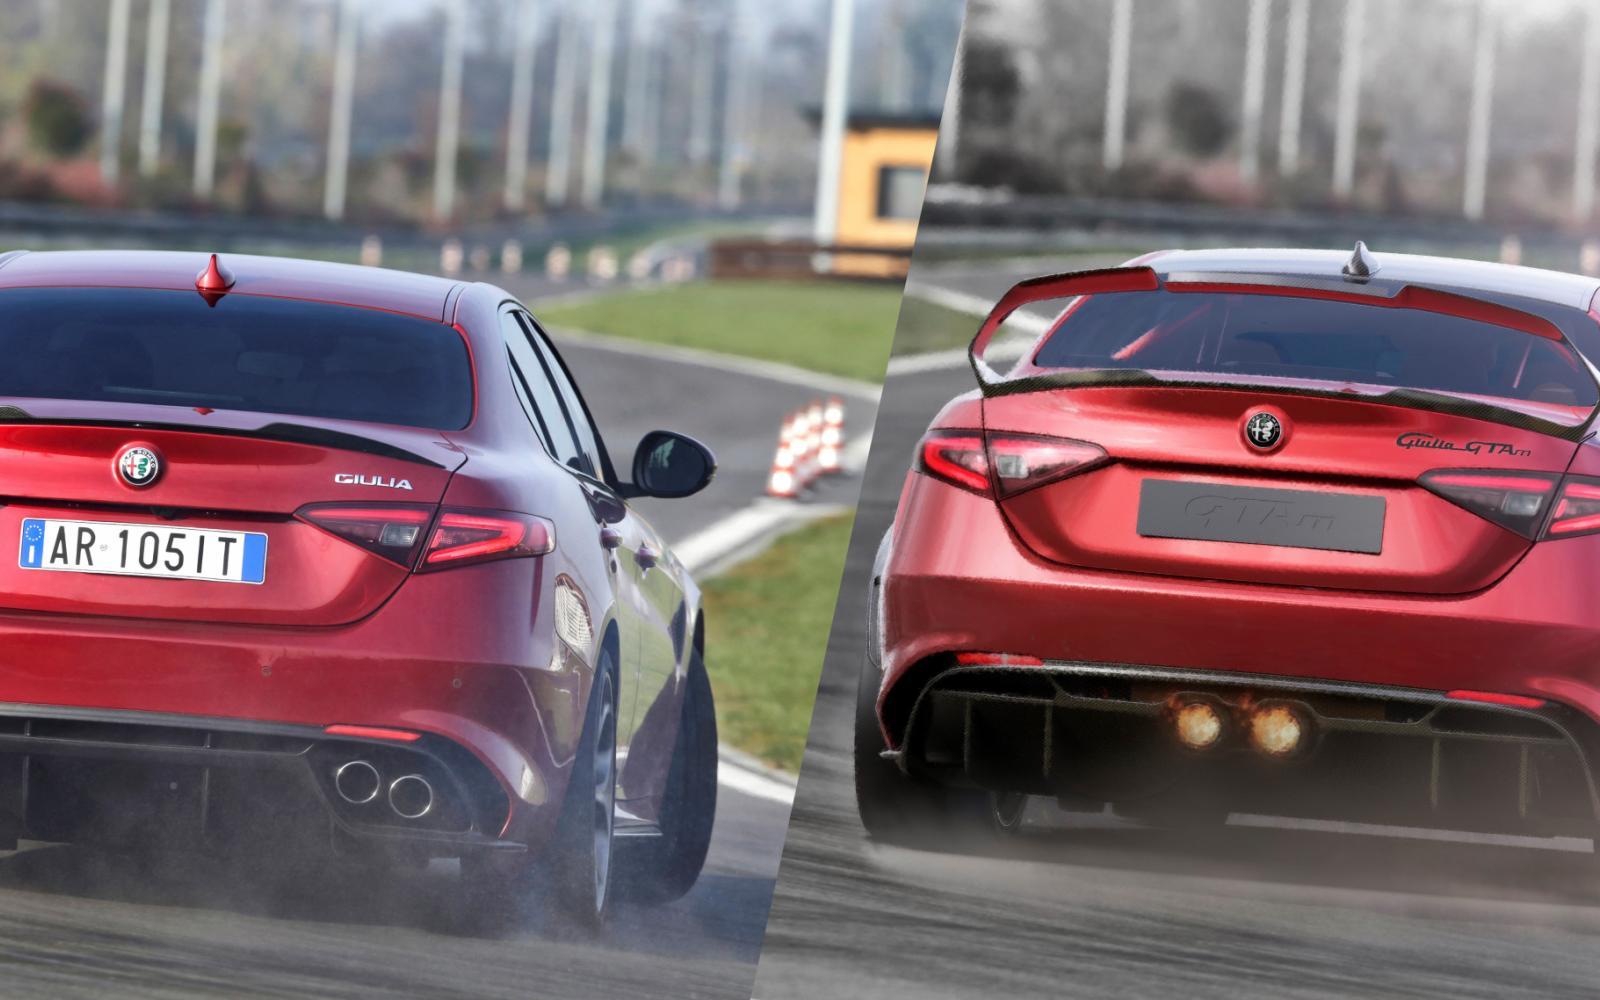 Alfa Romeo is heel erg slecht in photoshoppen